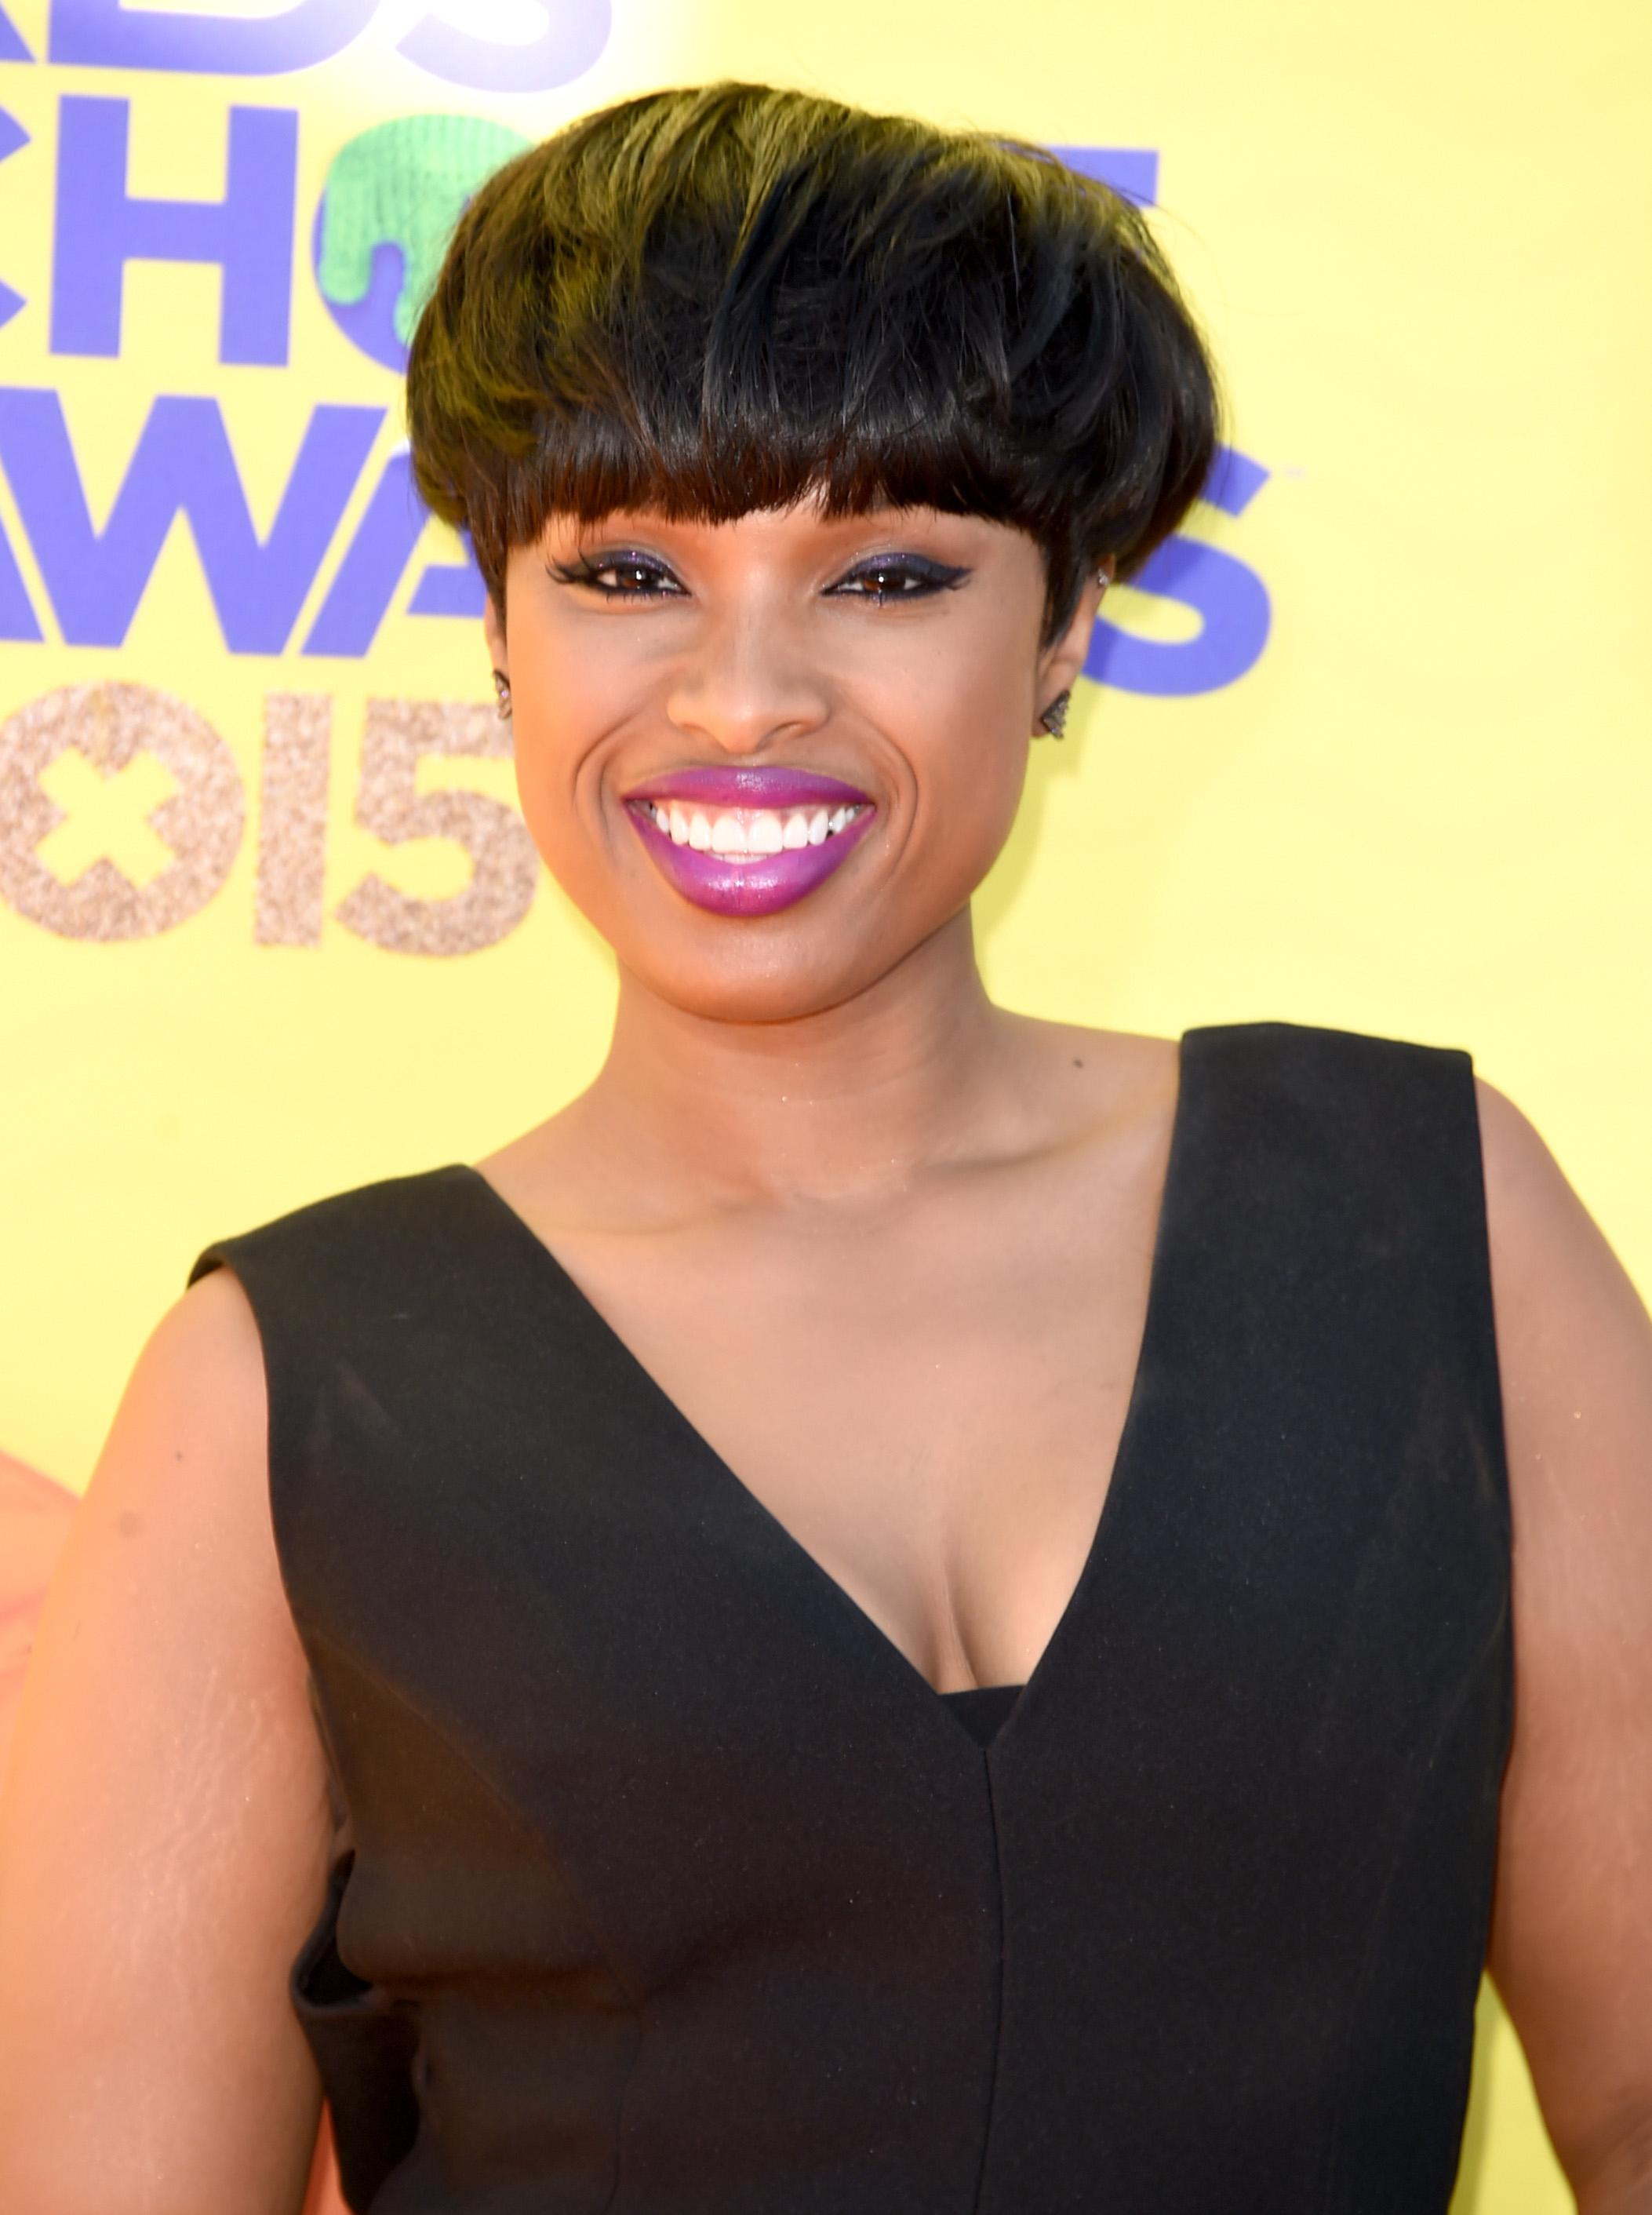 50 best short hairstyles for black women 2017 black hairstyles 50 best short hairstyles for black women 2017 black hairstyles for short hair urmus Choice Image